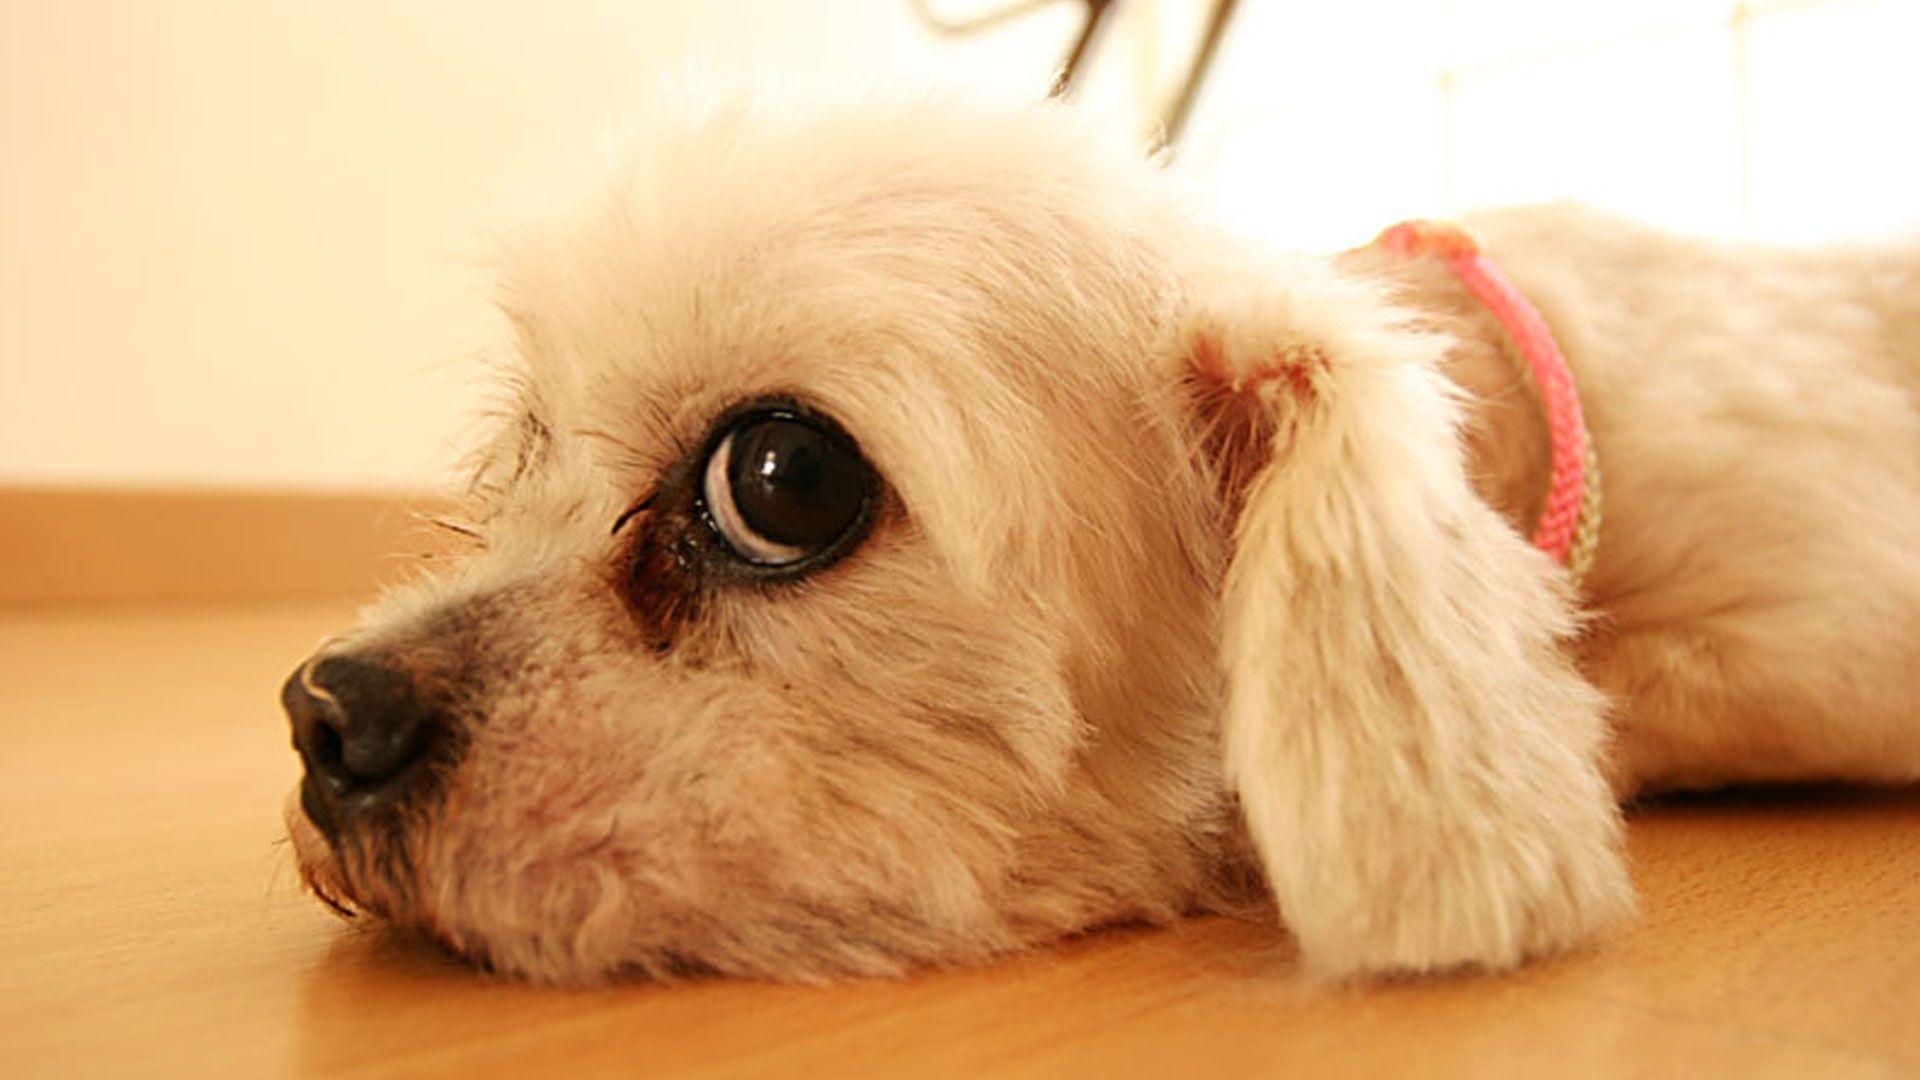 Black Dog HD Wallpapers - Free download latest Black Dog HD ...